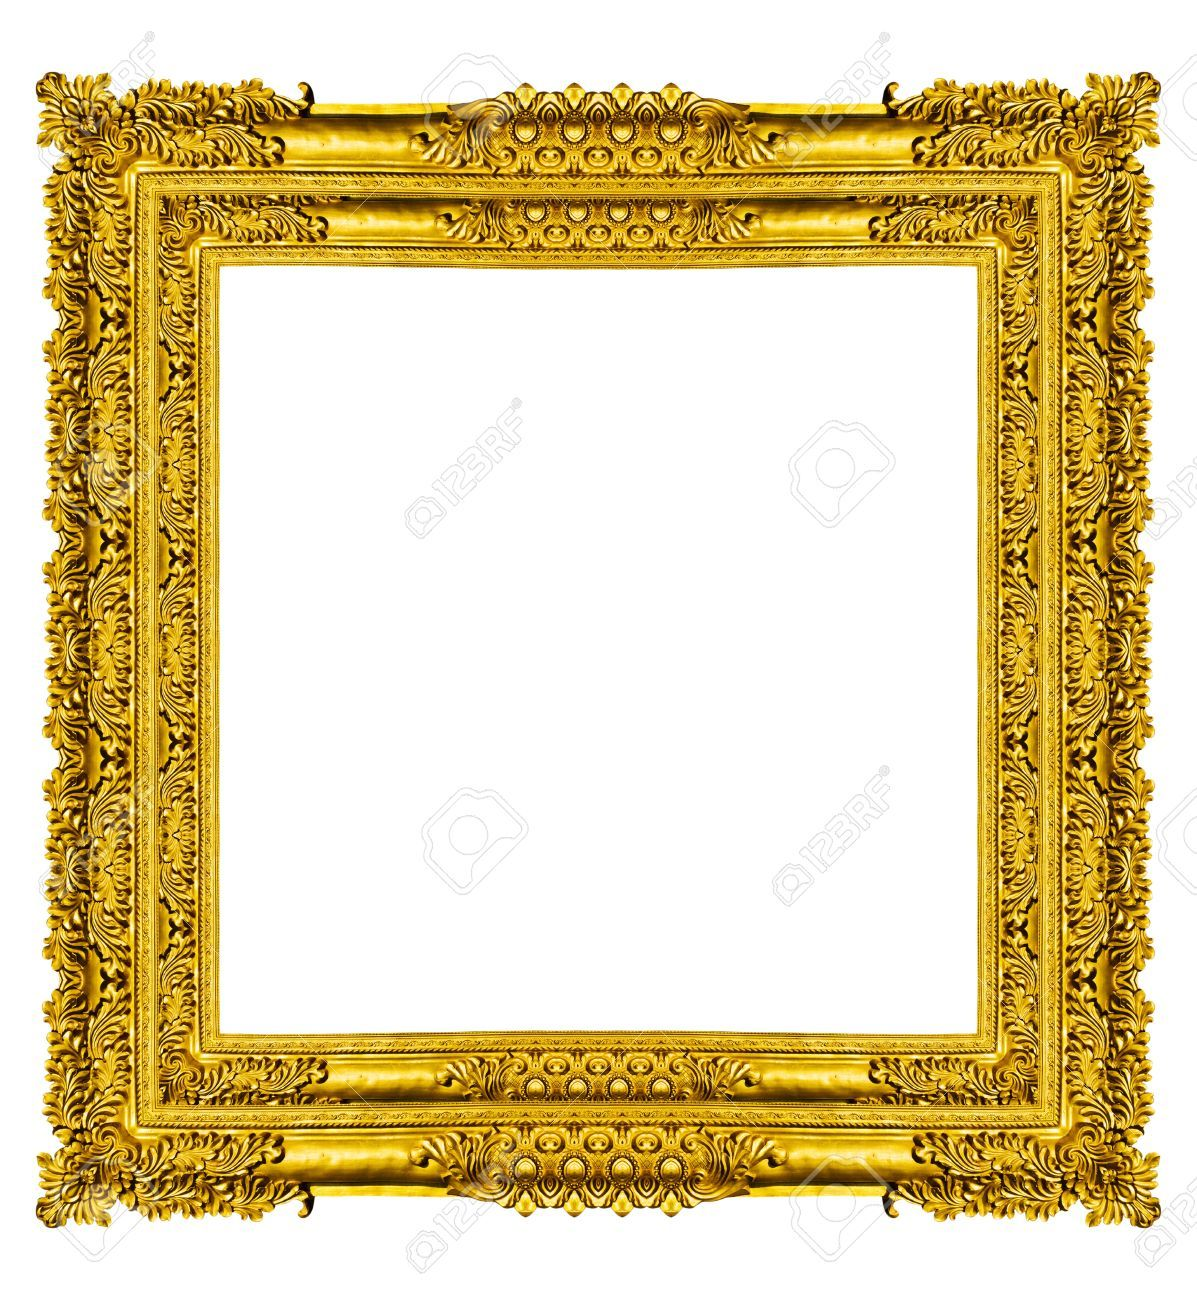 Empty Golden Vintage Frame Isolated On White Background Vintage Frames Frame Gold Picture Frames